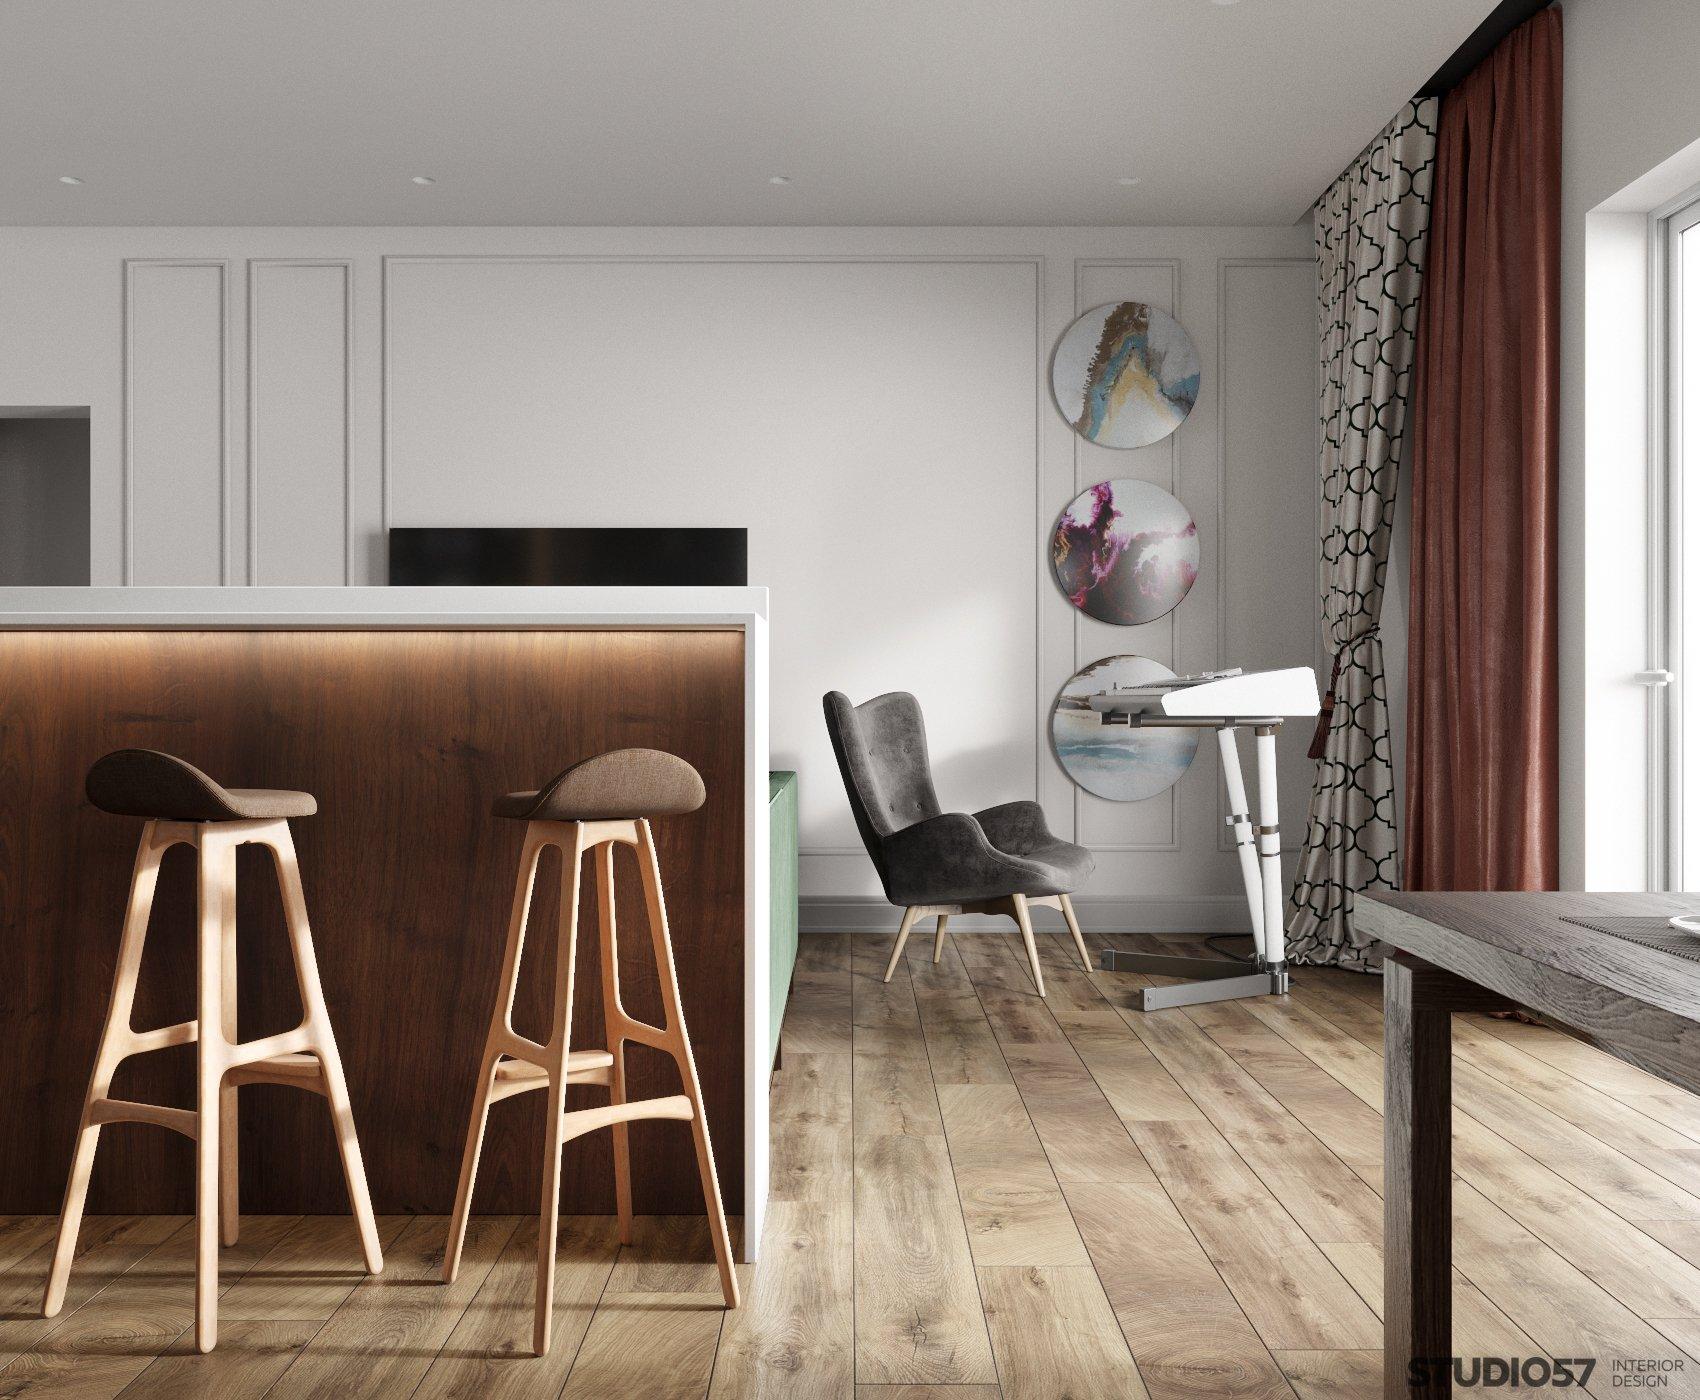 Original interior in Contemporary style photo